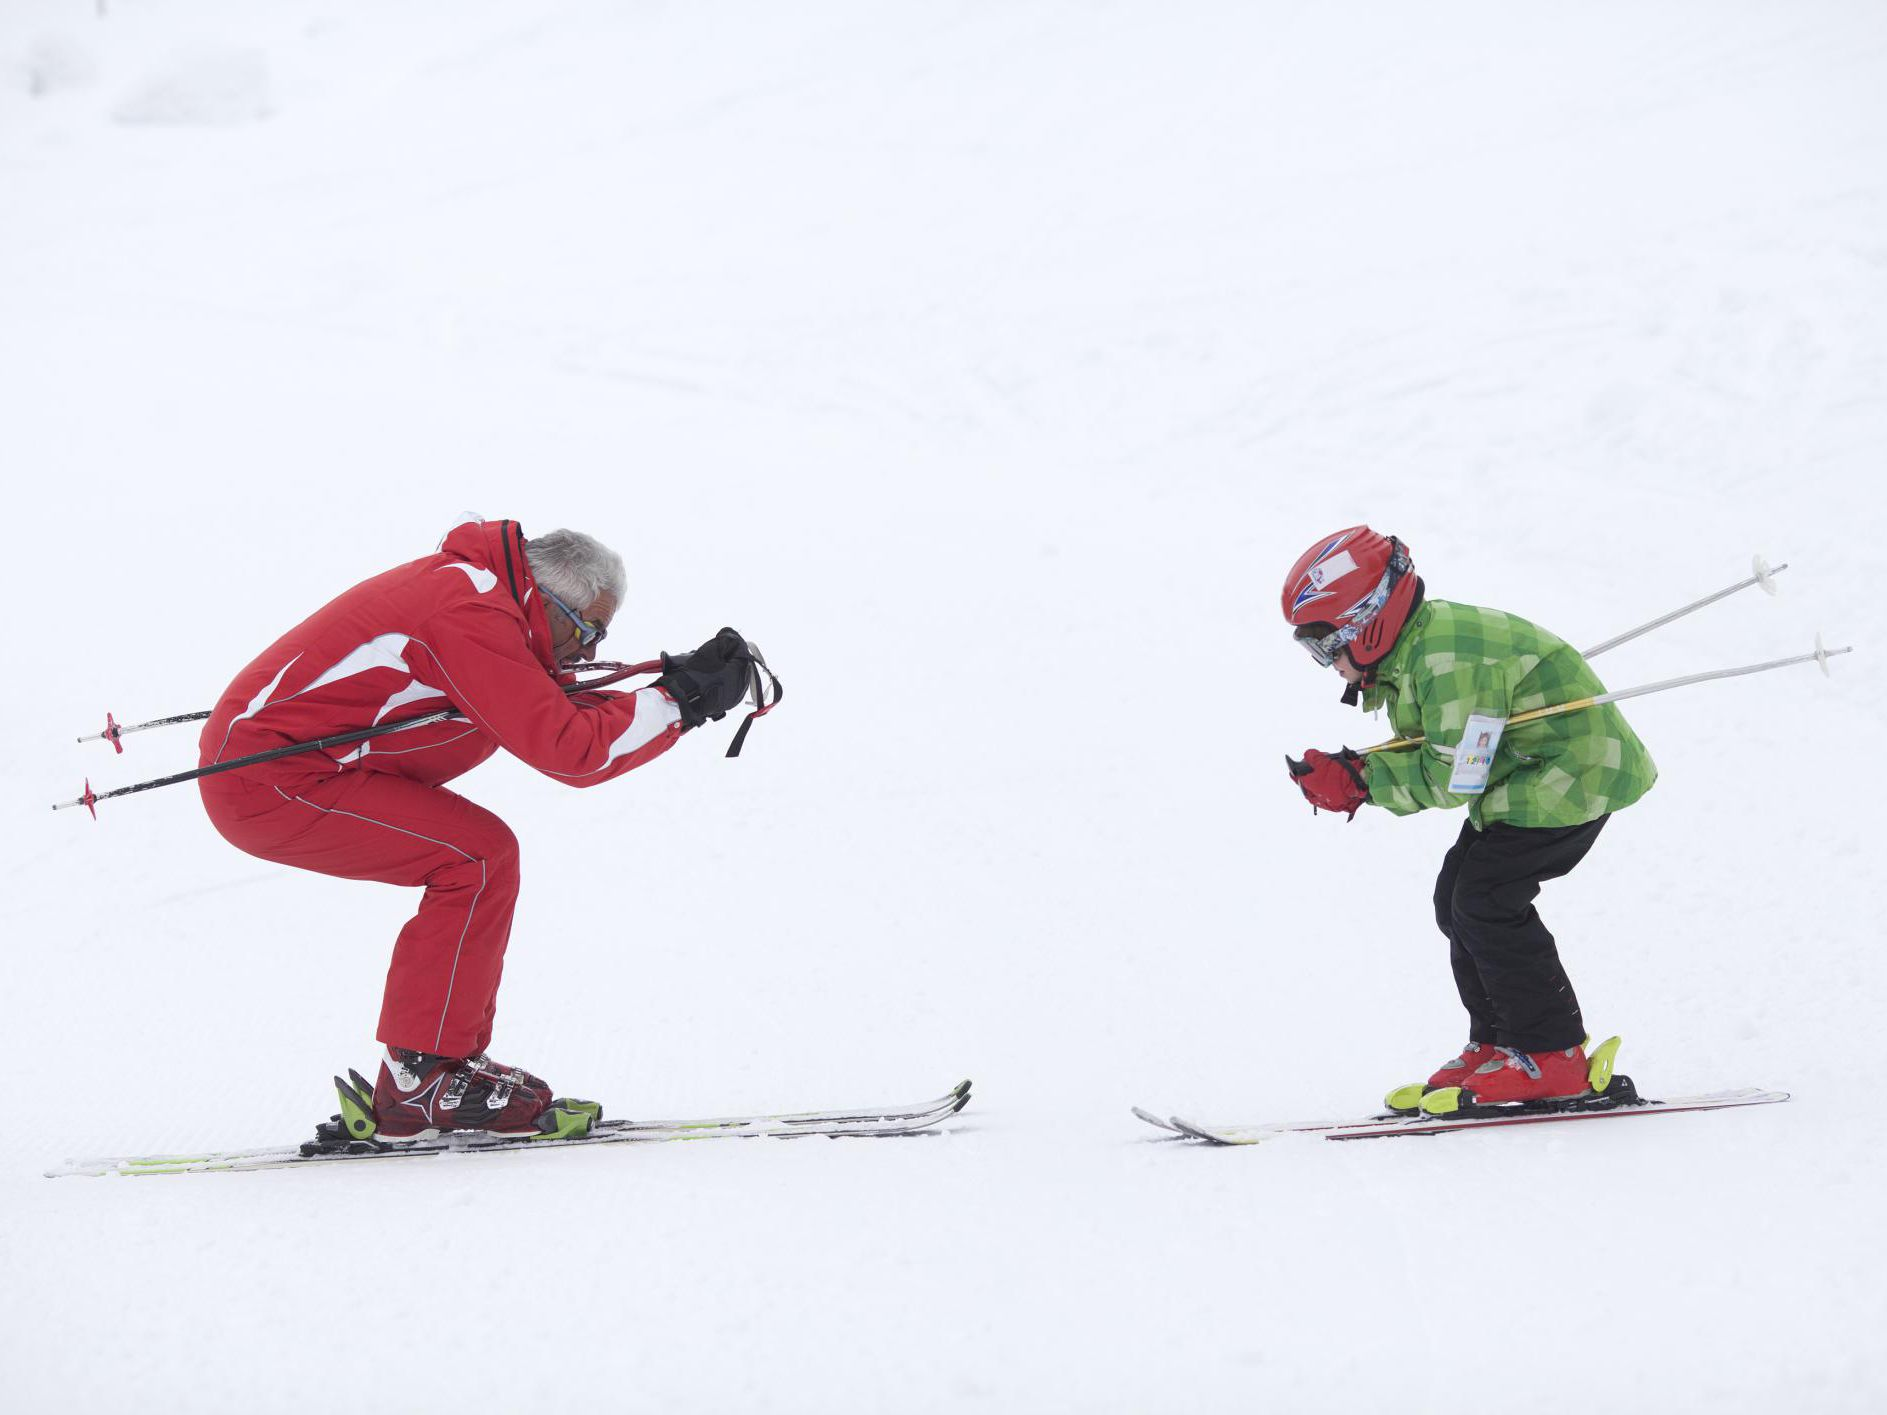 How Much Money Do Ski Instructors Make?